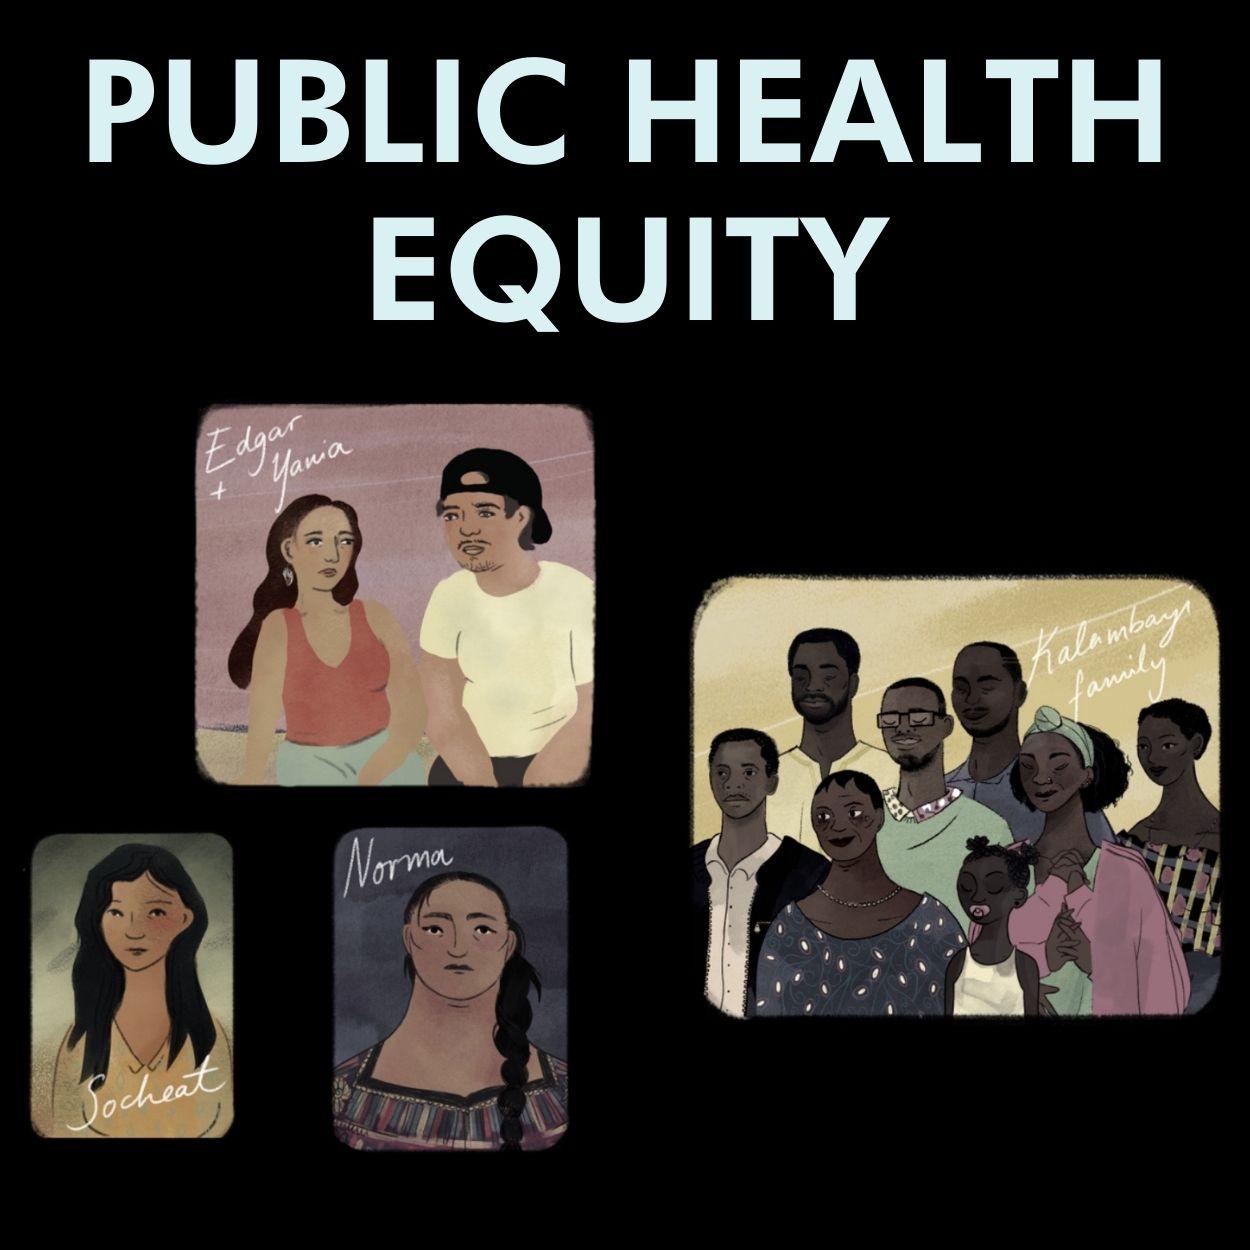 PUBLIC HEALTH EQUITY (3)